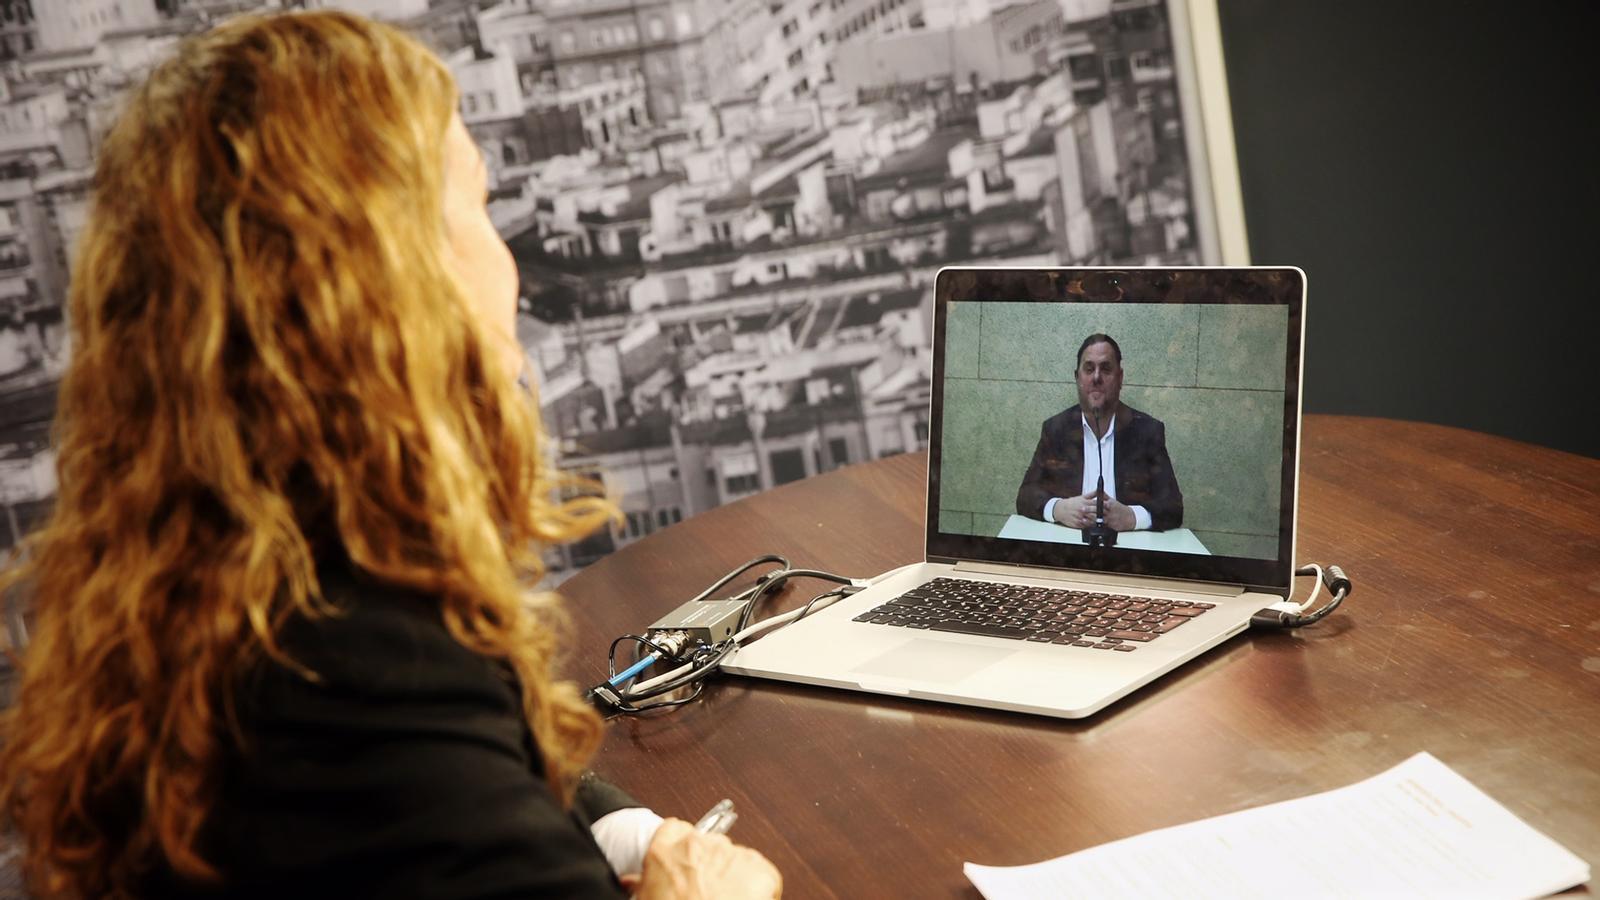 Entrevista d'Esther Vera a Oriol Junqueras